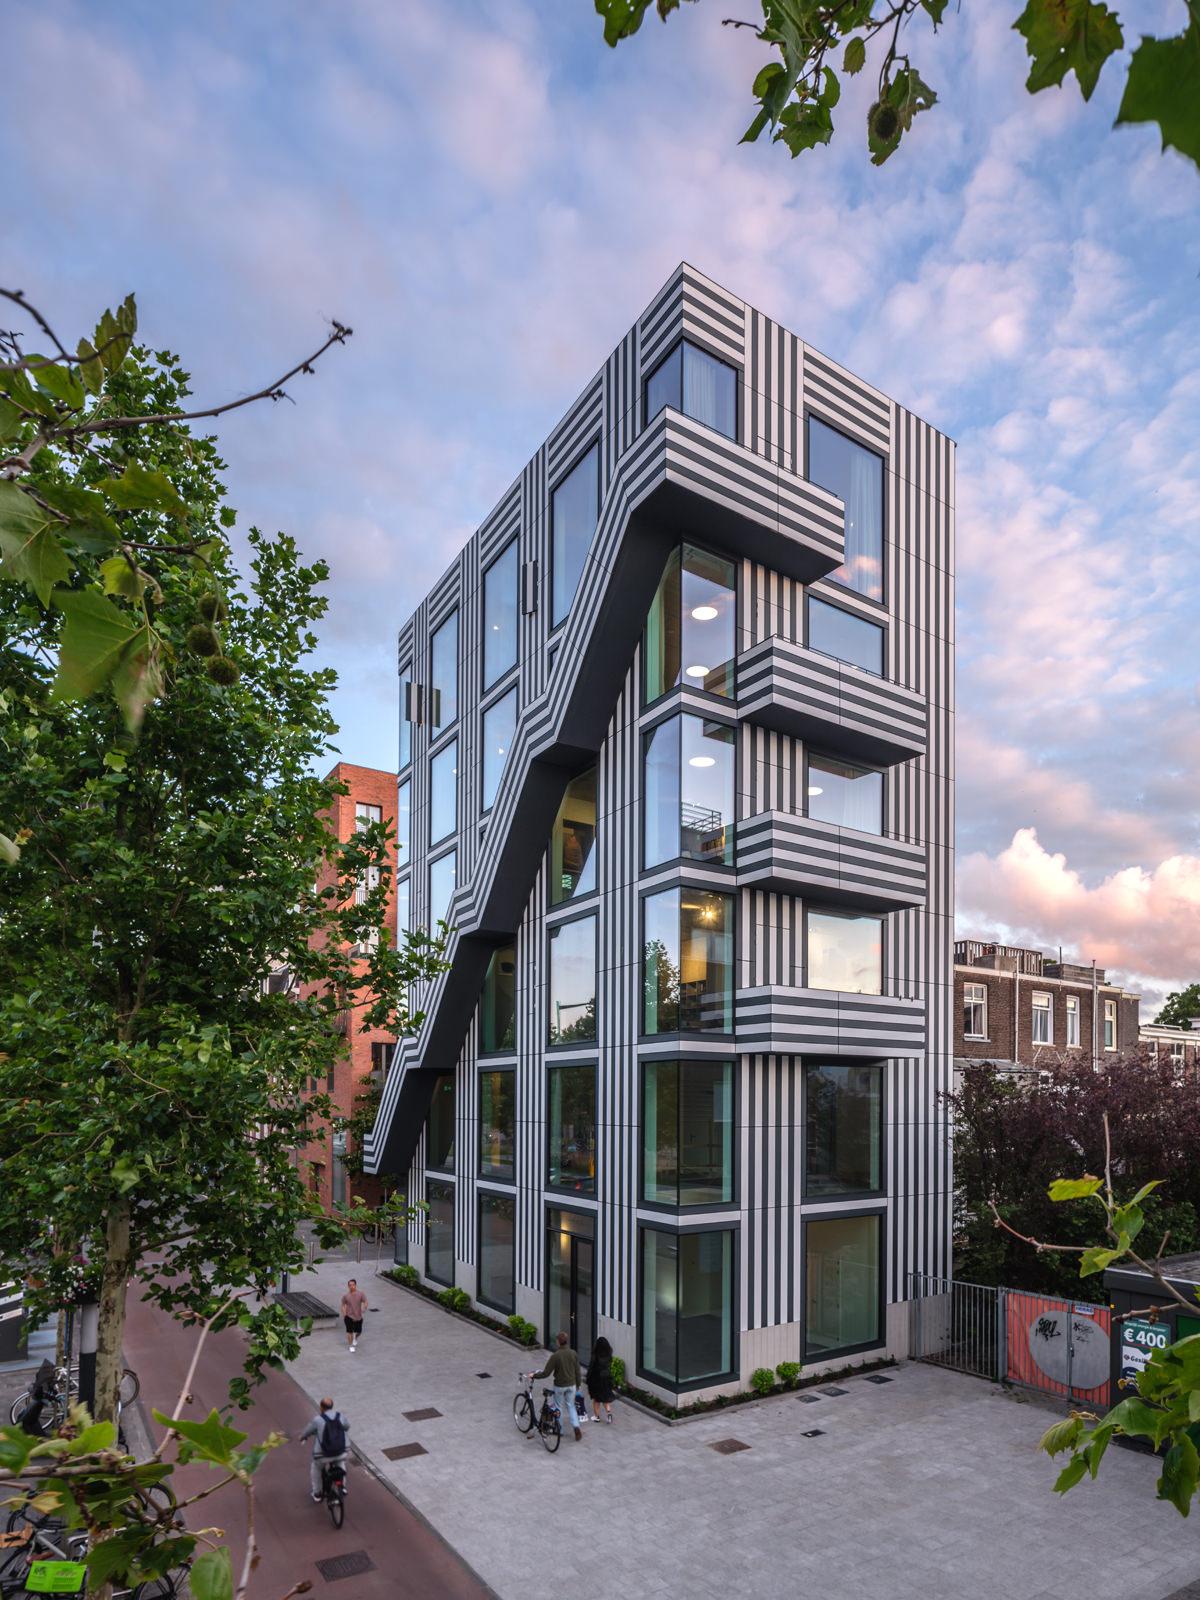 Studio Thonik Amsterdam Thomas Widdershoven Mmx Architects Photo Ossip Yellowtrace 26